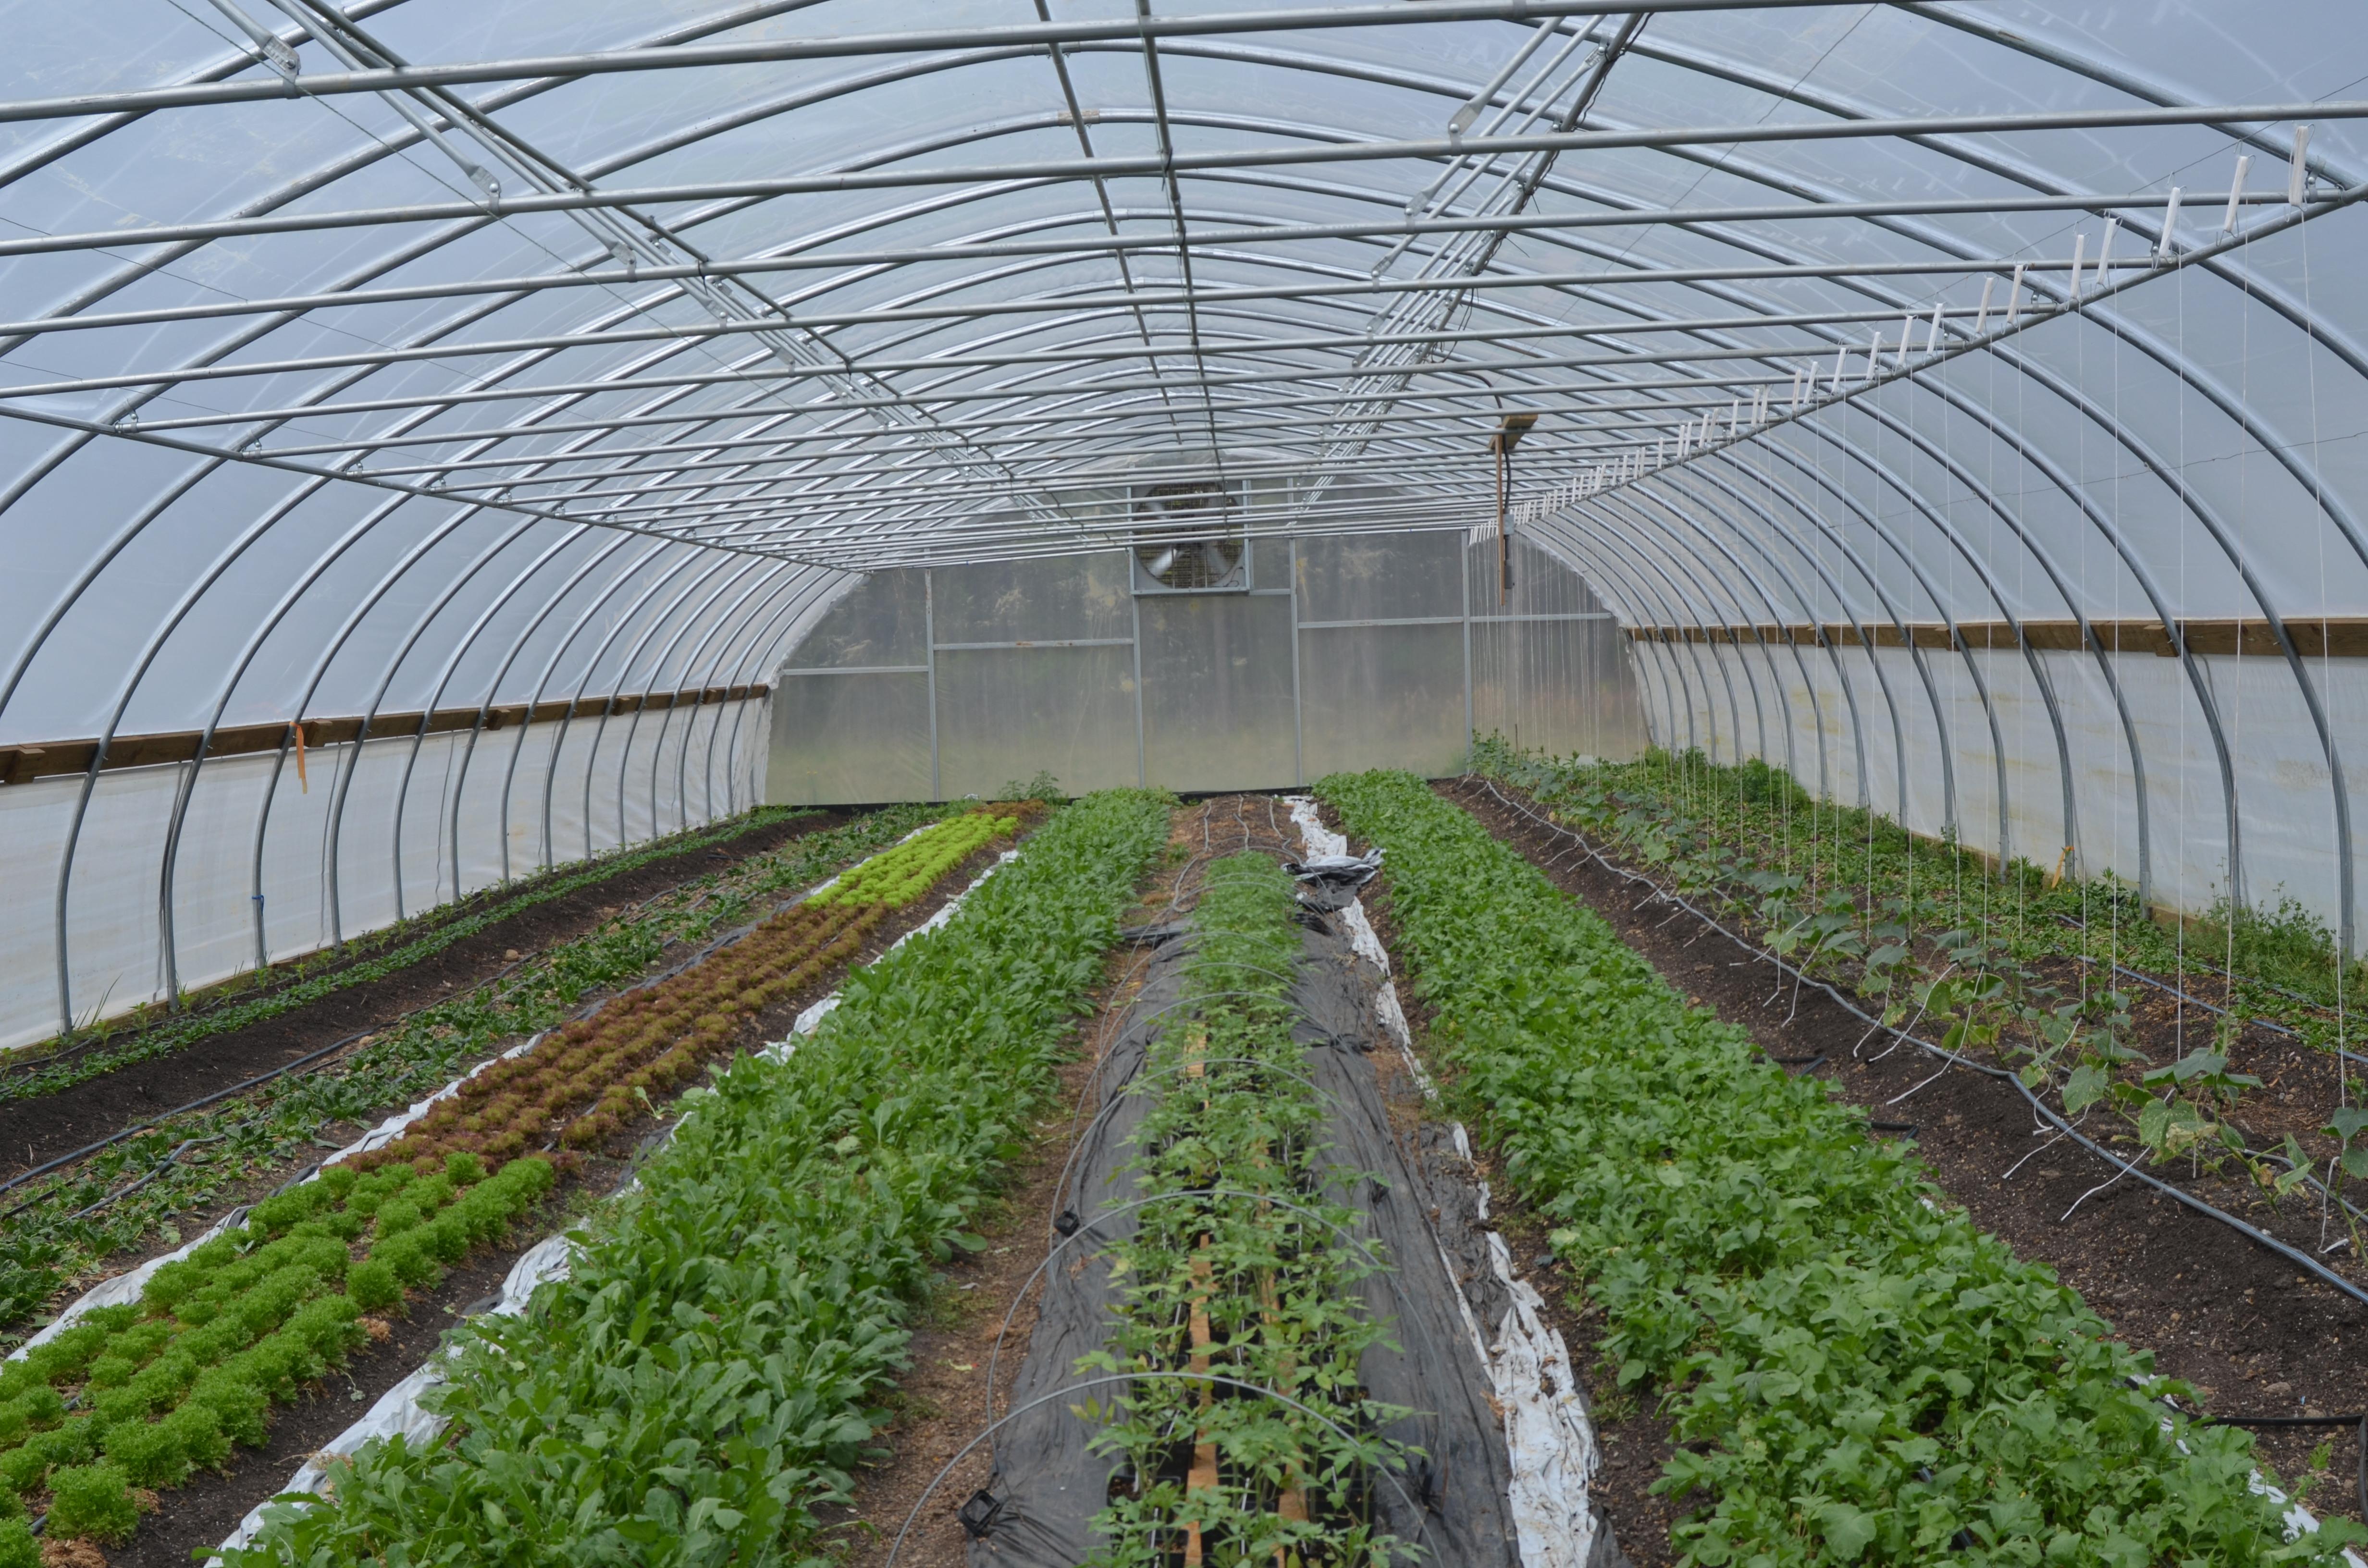 Broadfork Farm